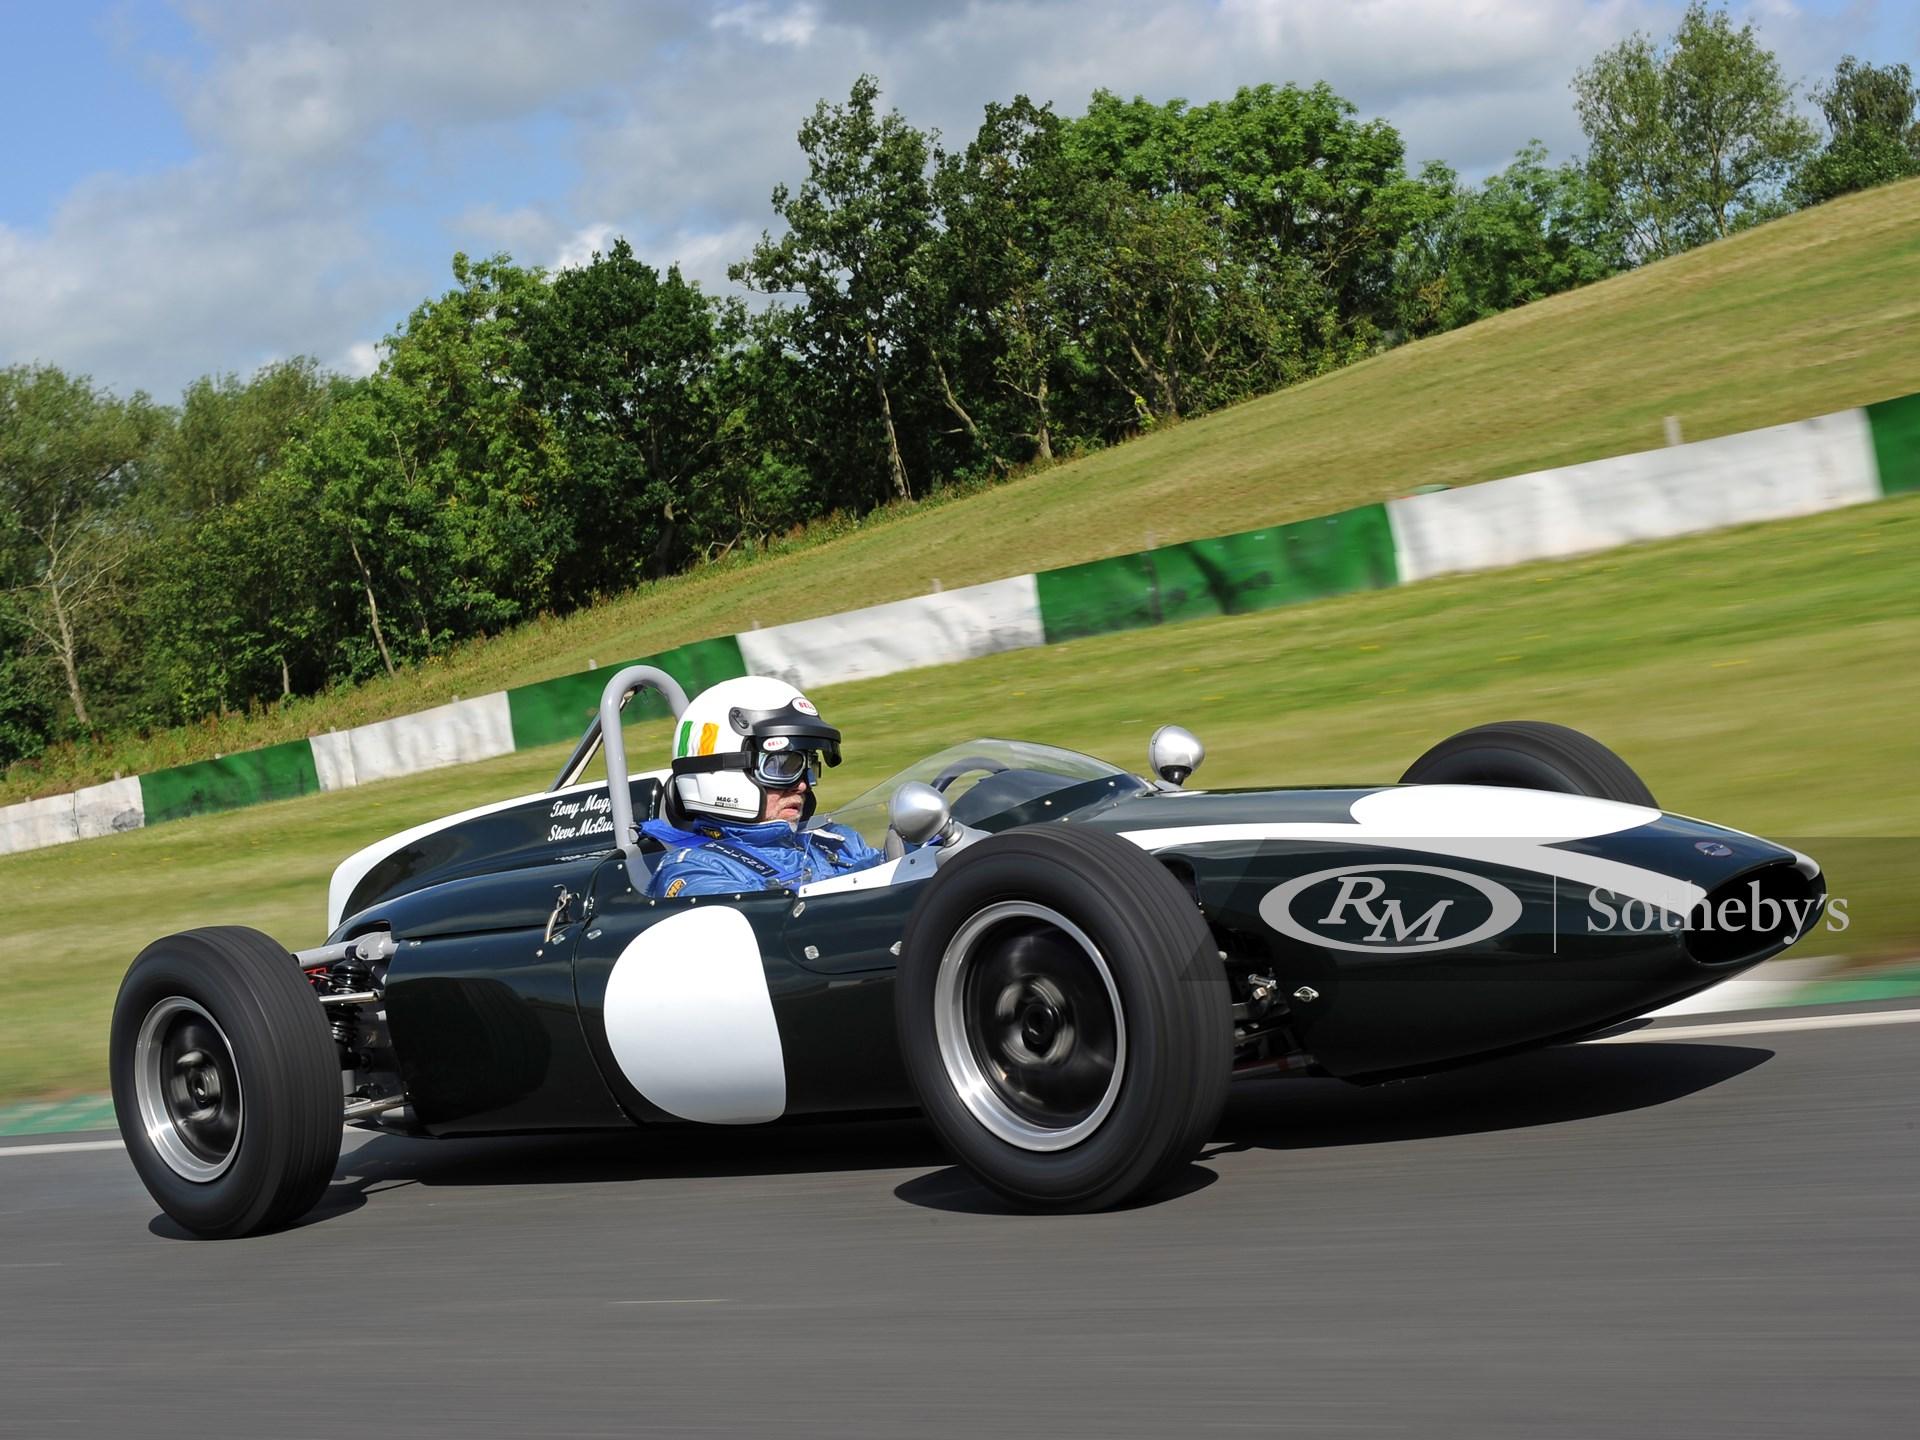 1961 Cooper T-56 Mark II Formula Junior Racing Car  -